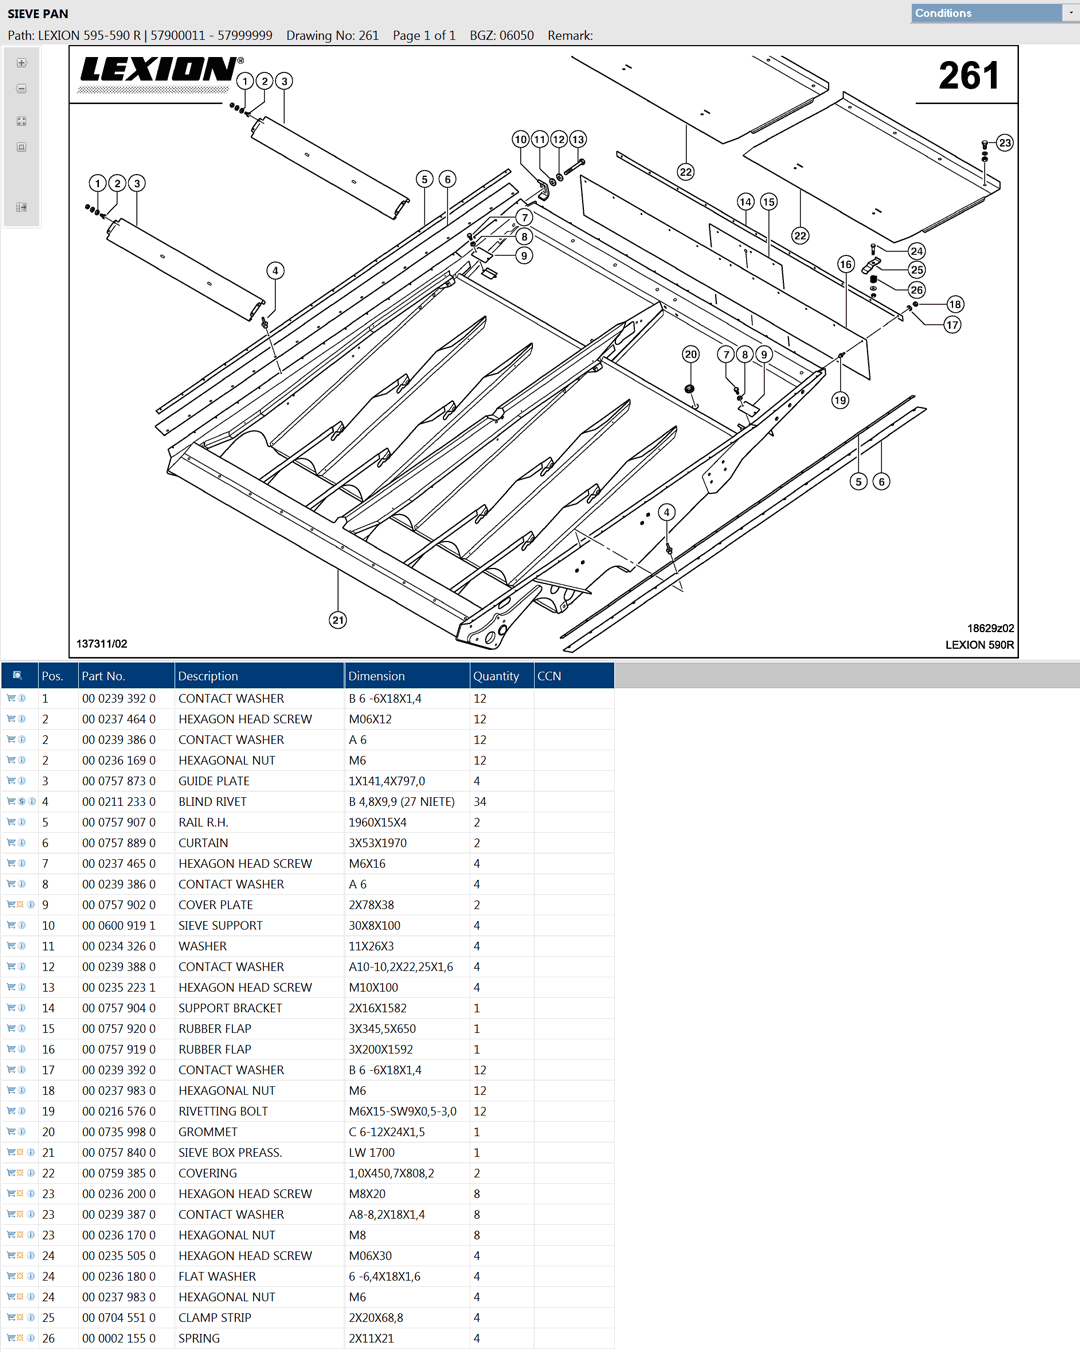 Lexion 595R combine parts and schemes - sieve pan